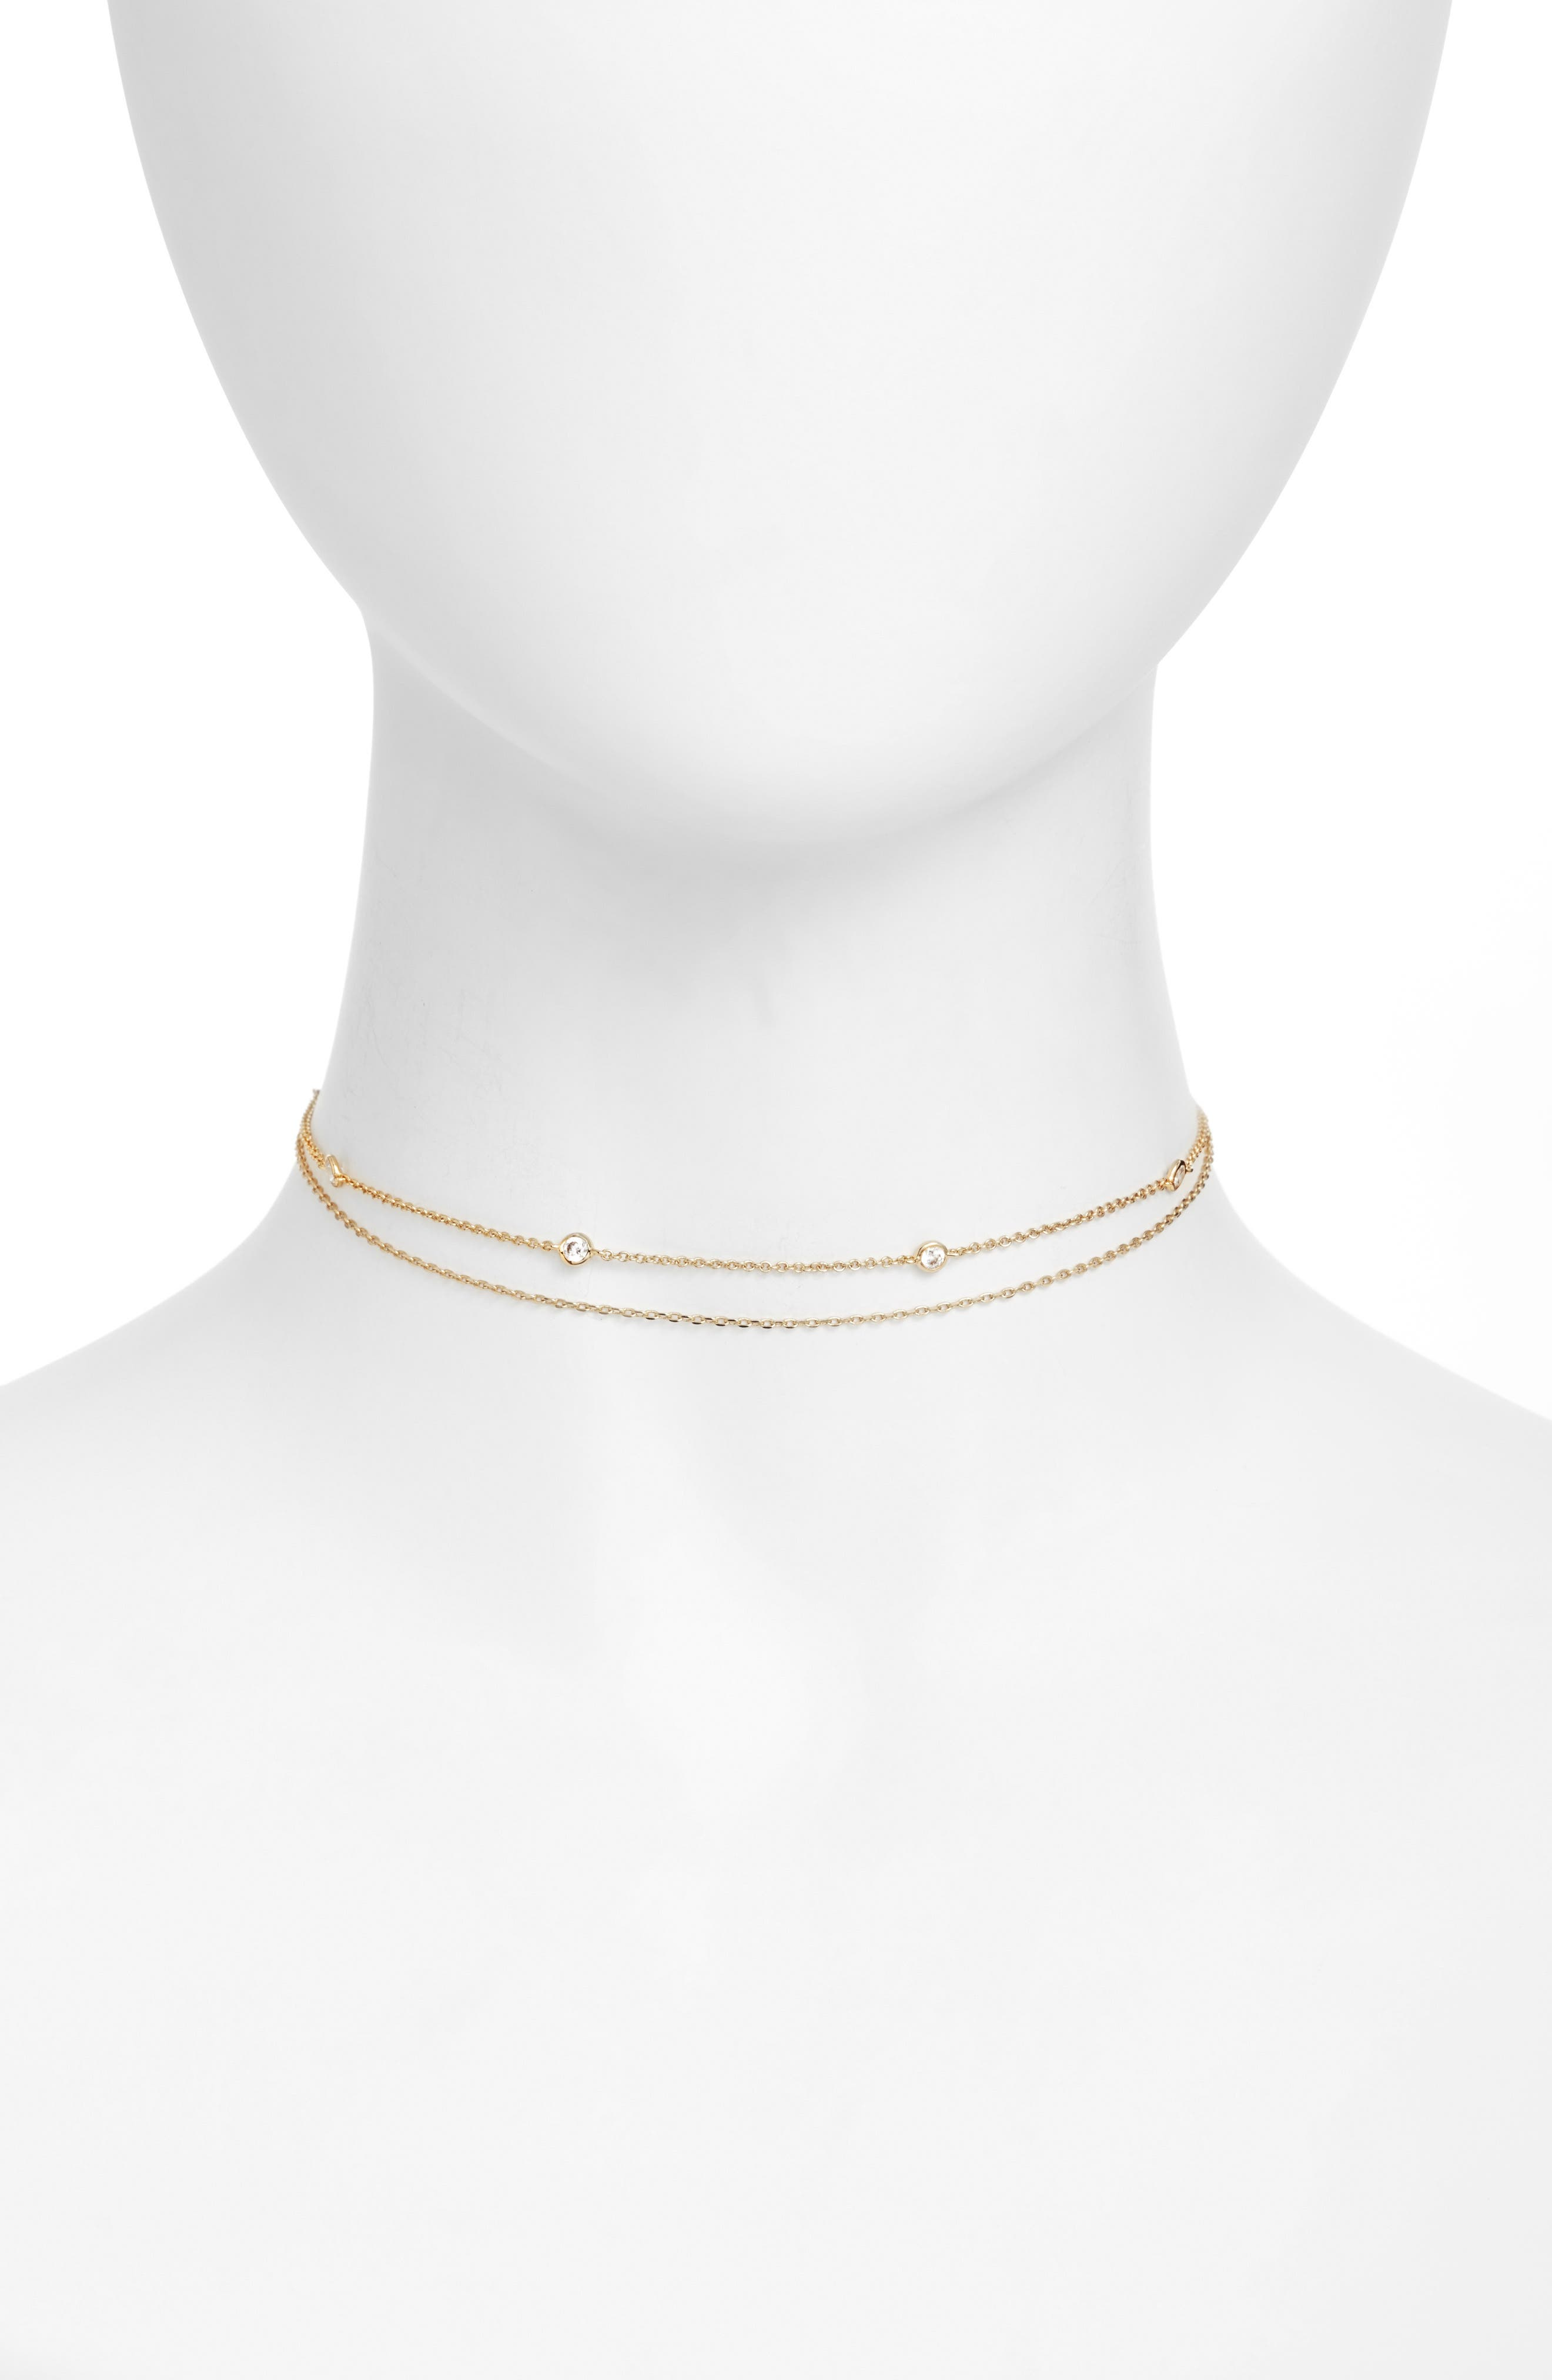 Crimson Chain Choker,                         Main,                         color, Gold/ Clear